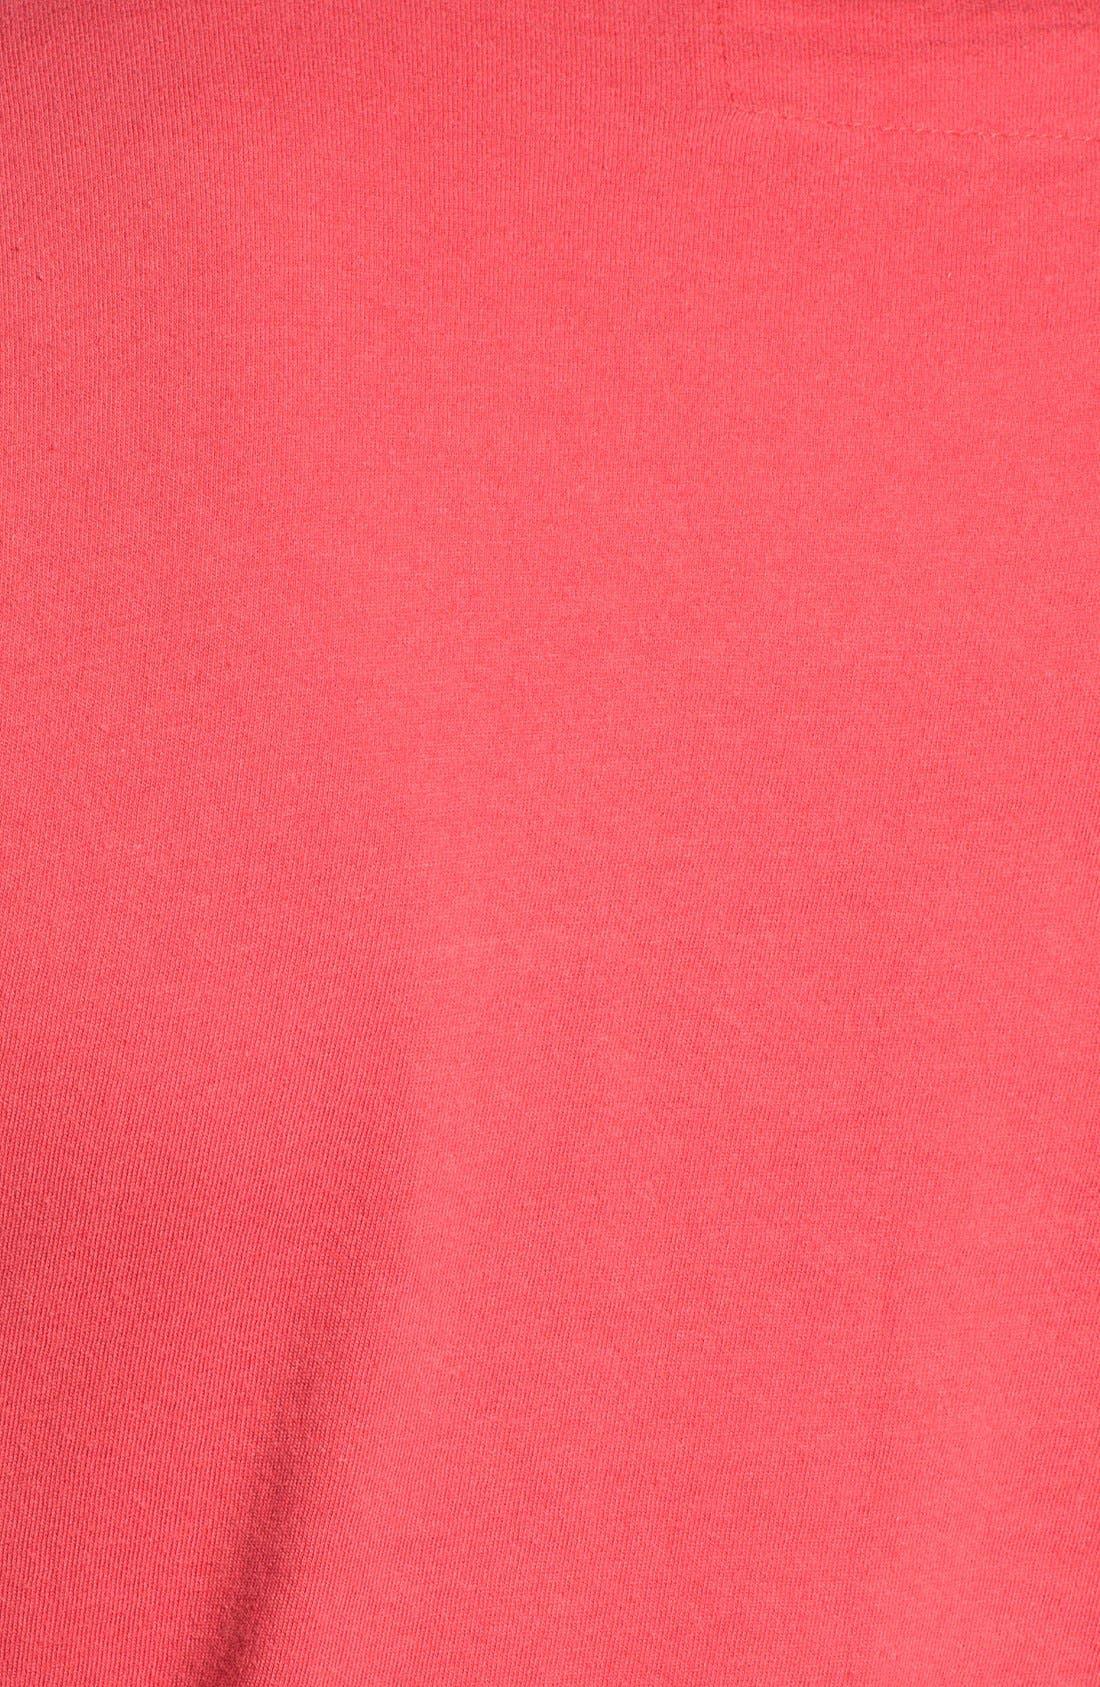 Alternate Image 3  - Red Jacket 'Washington Nationals' Trim Fit T-Shirt (Men)